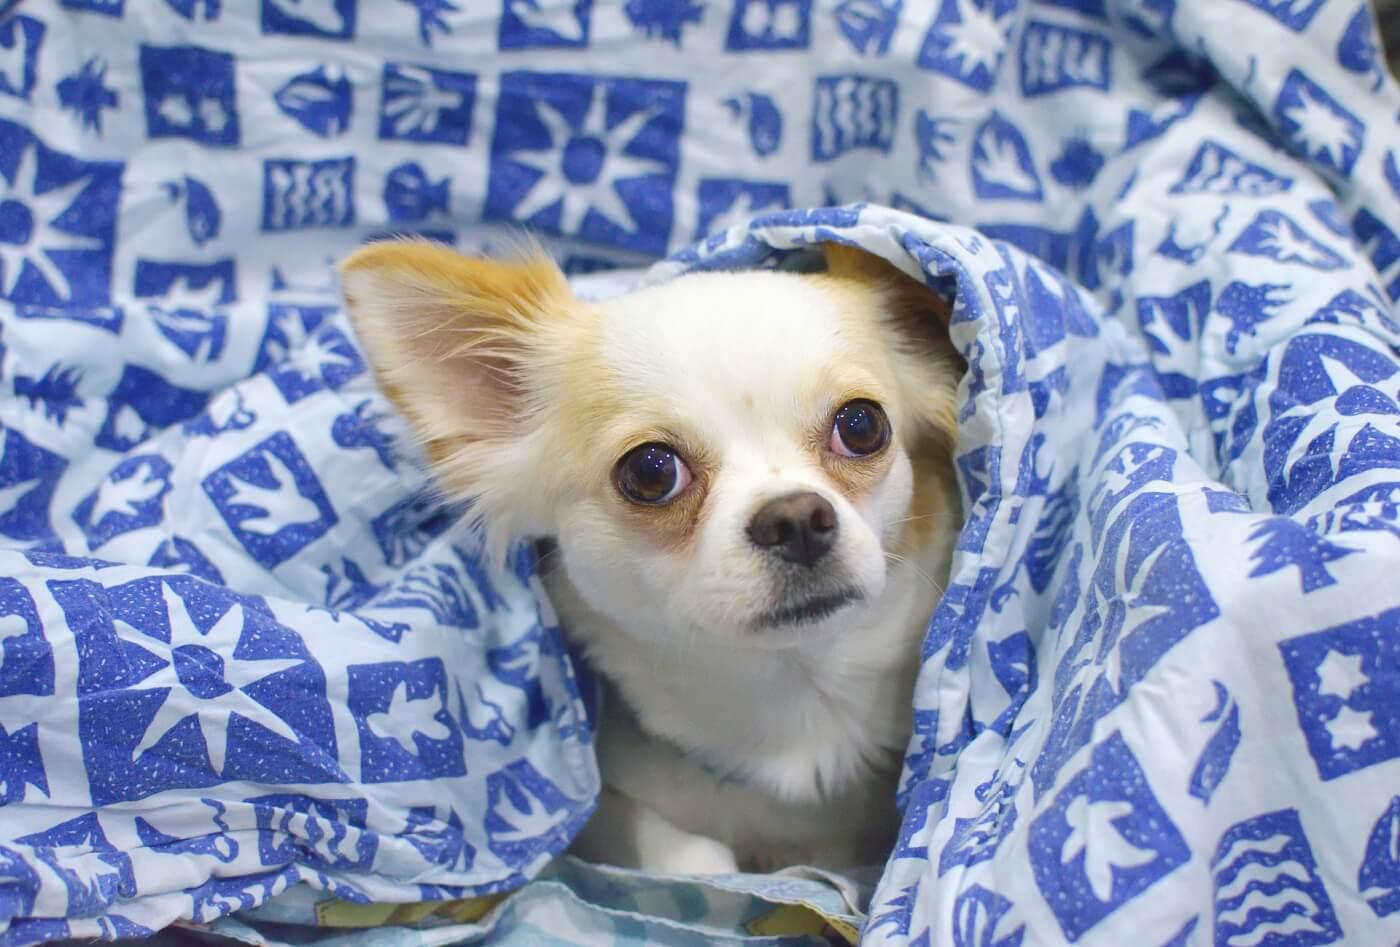 small, dog, blue, white, blanket, rescue